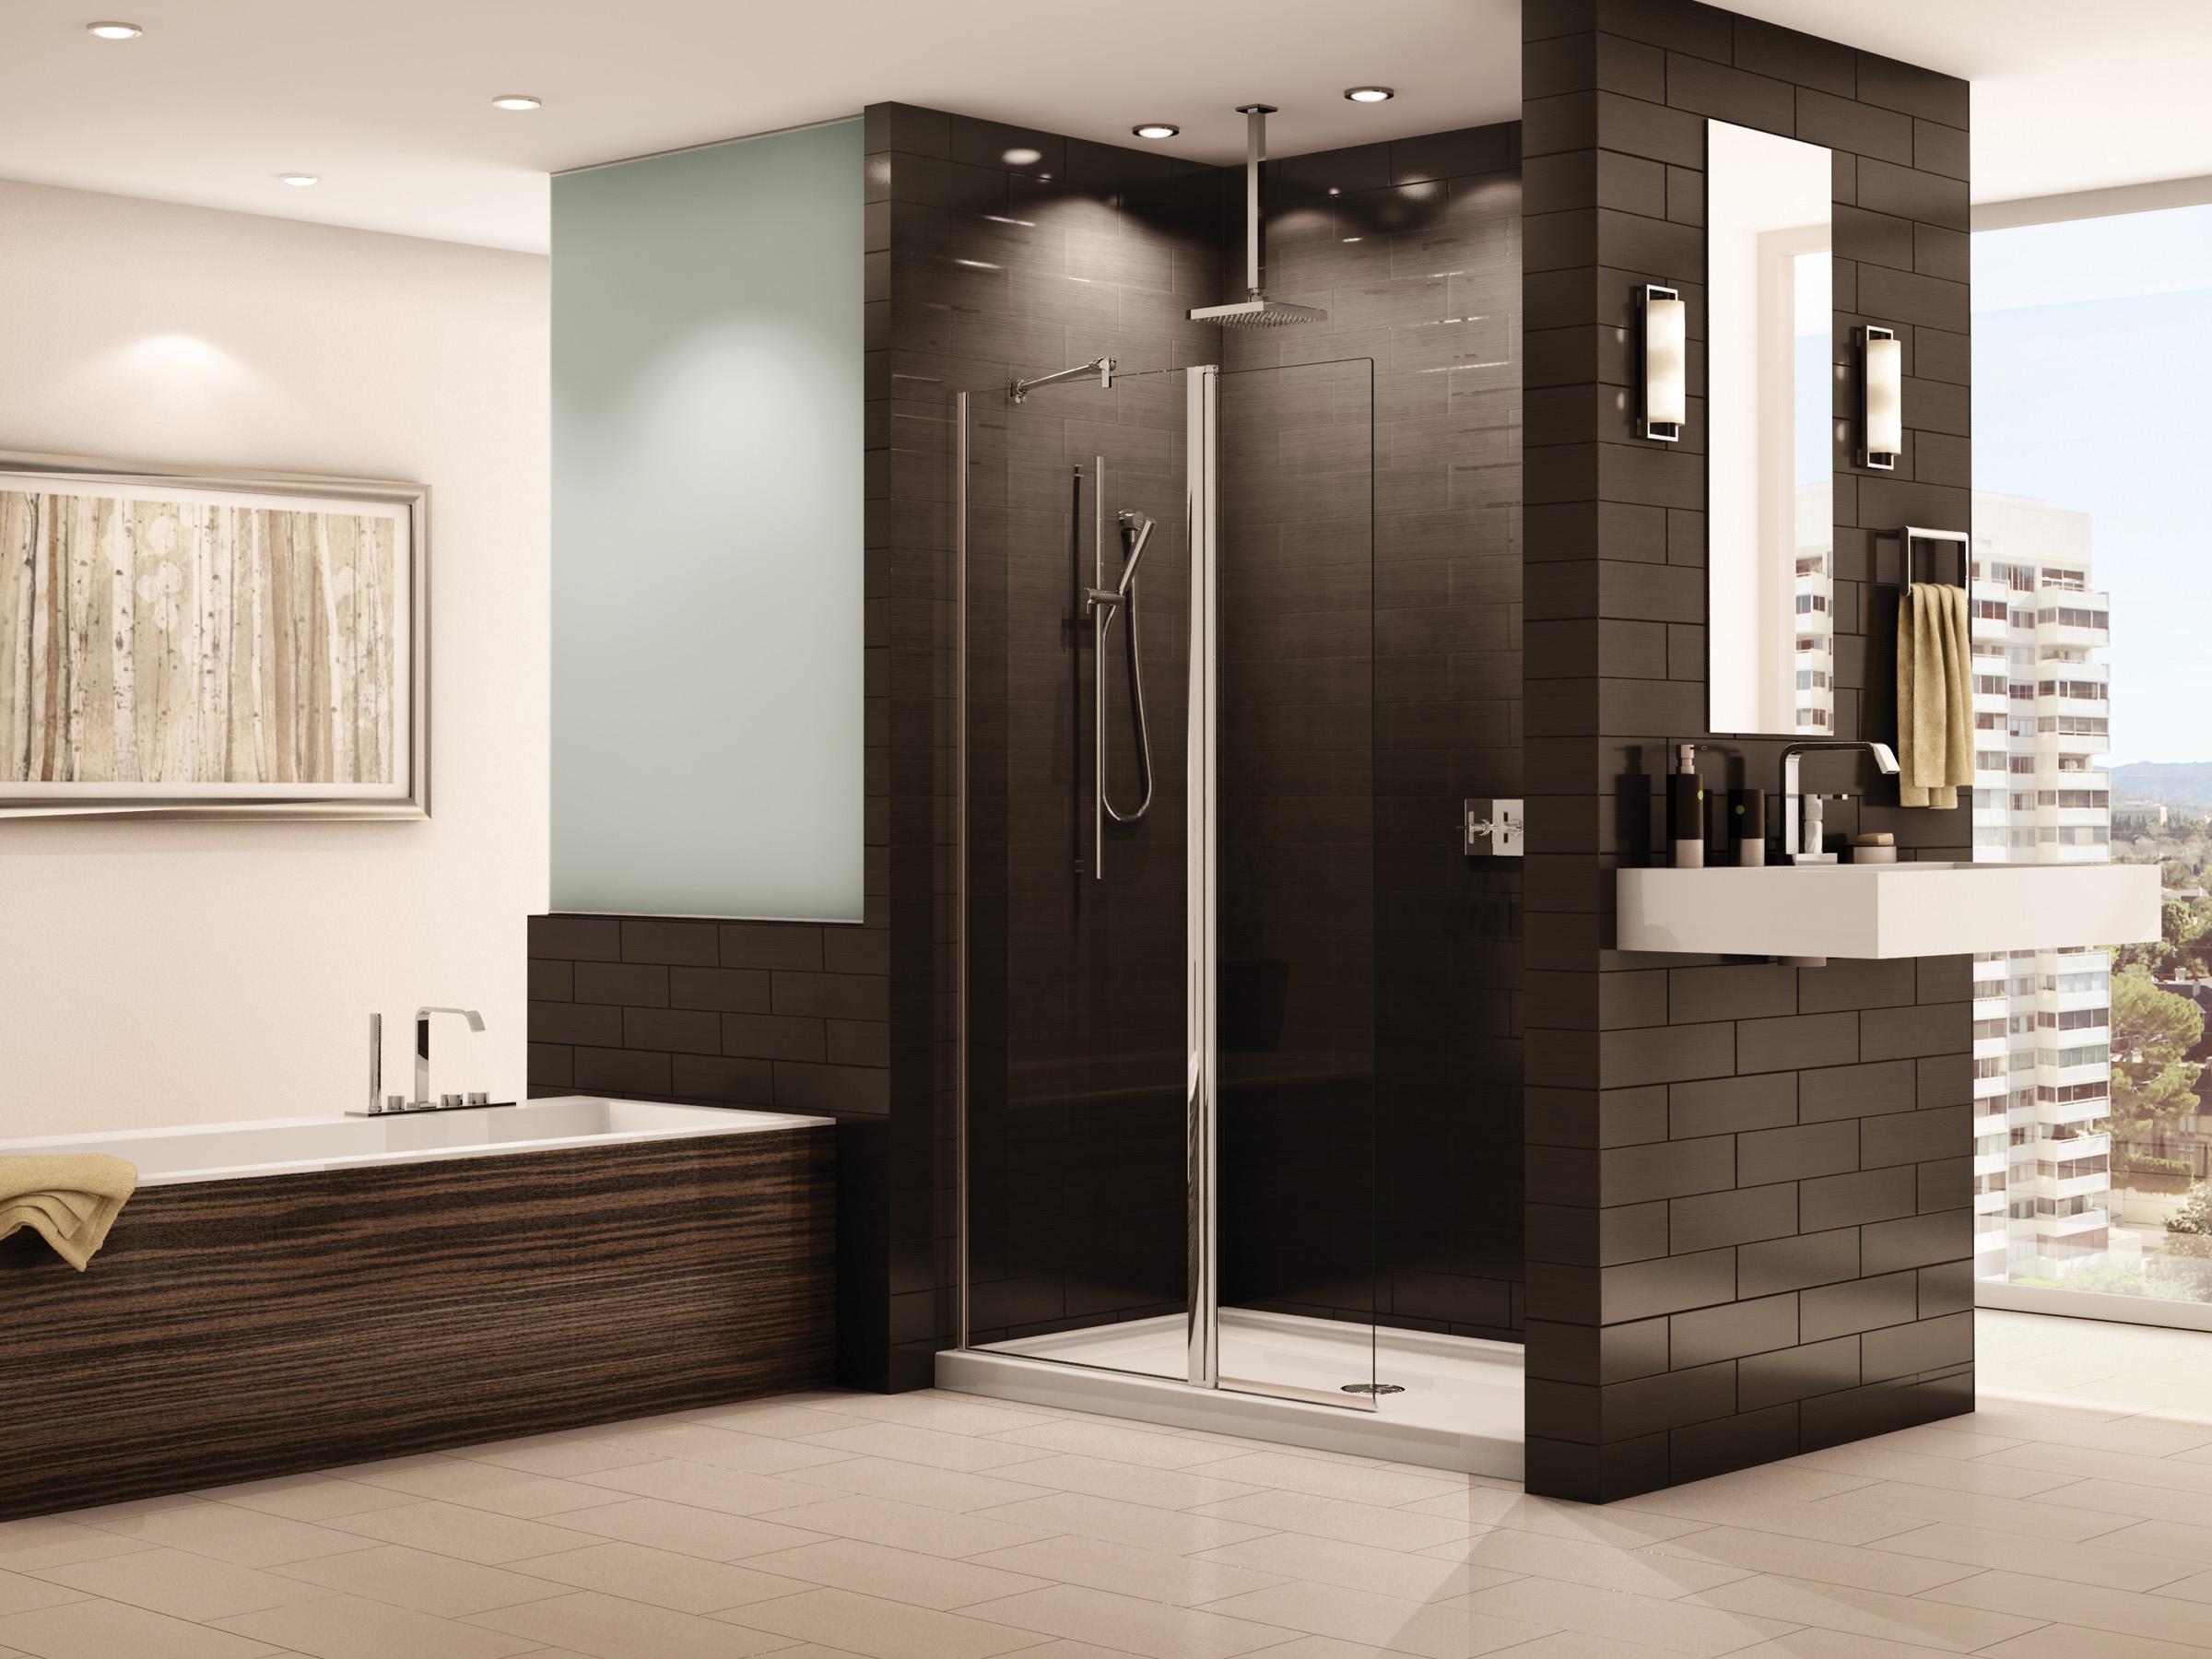 ... exellent bathroom design ideas steam shower idea q throughout ...